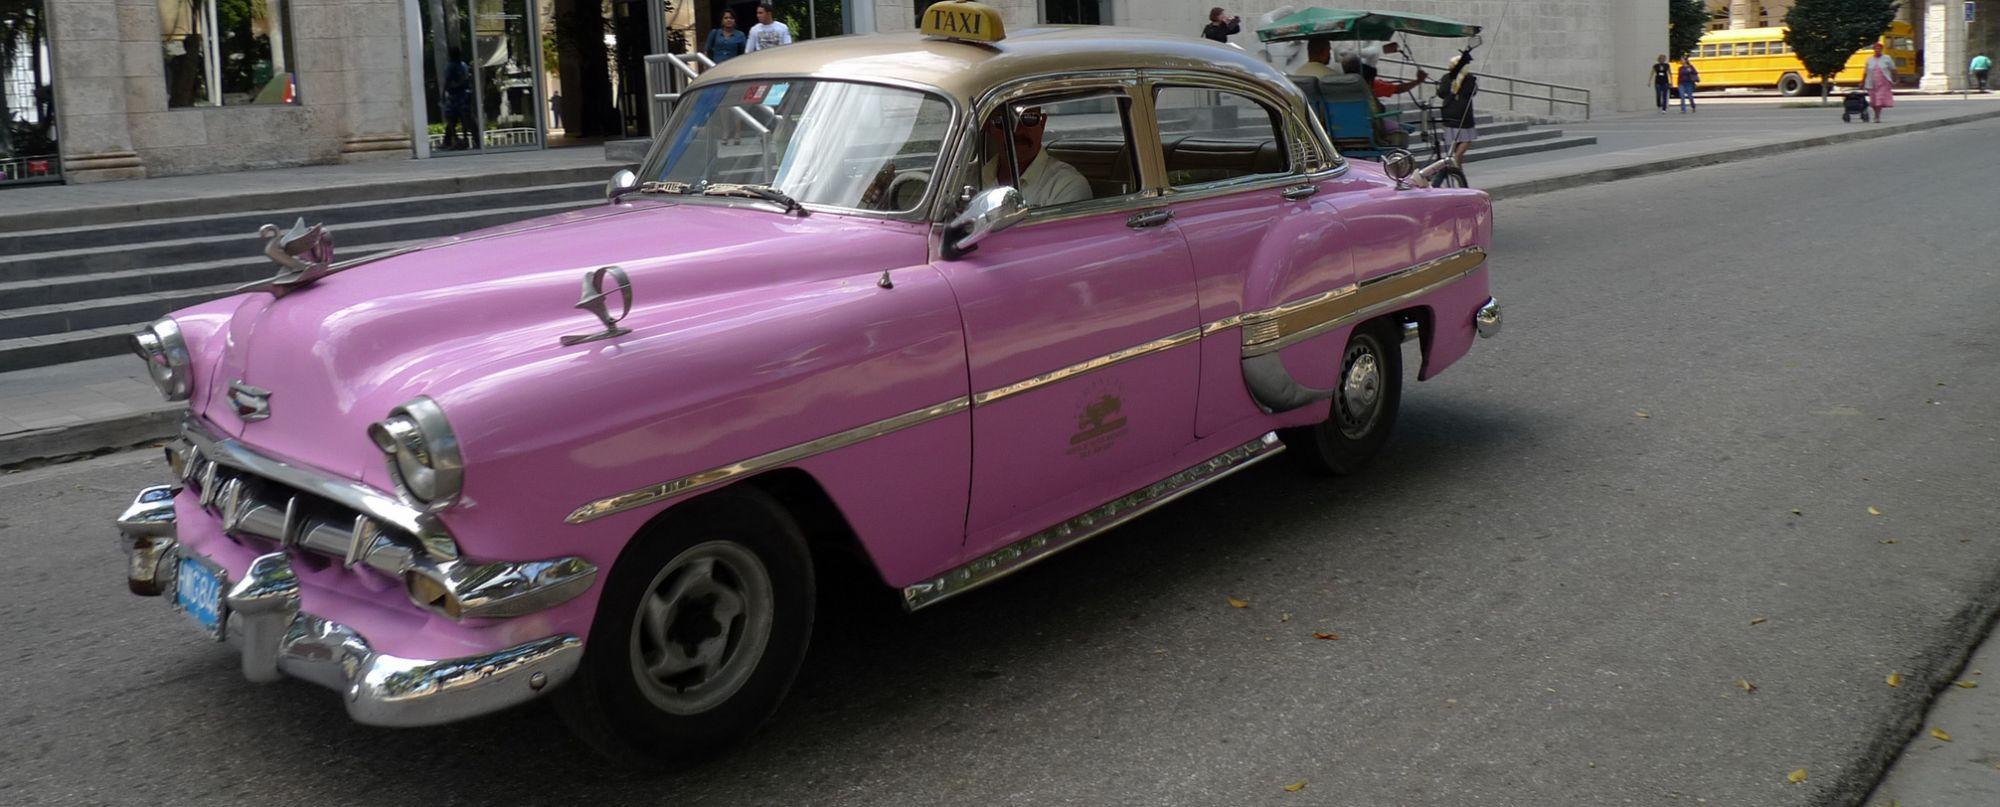 Cuba - De Sierra Maestra a La Habana